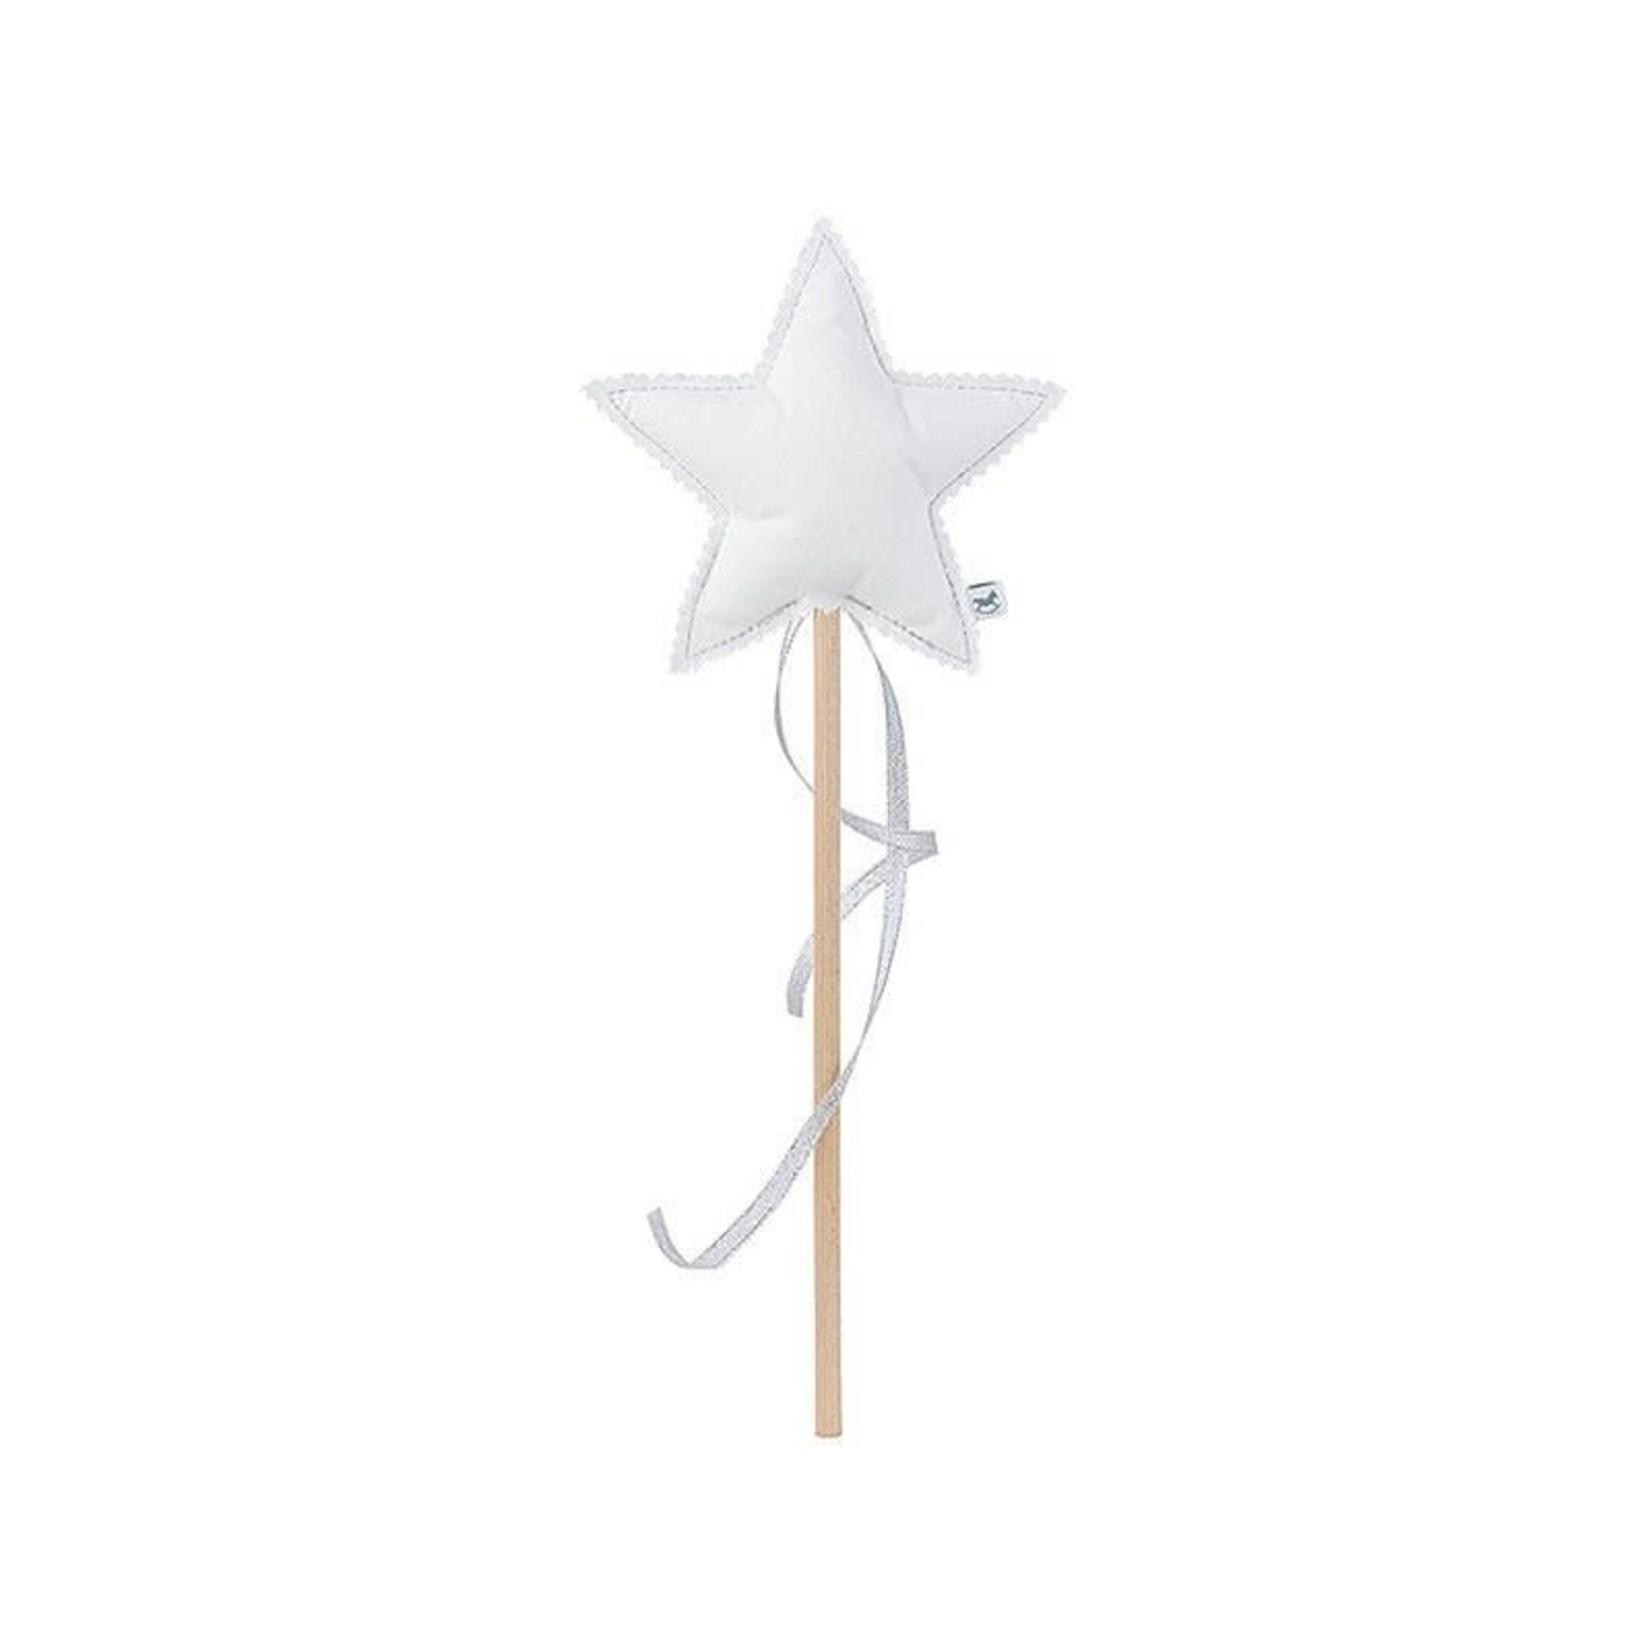 Sunnylife Linen Magic wand - White